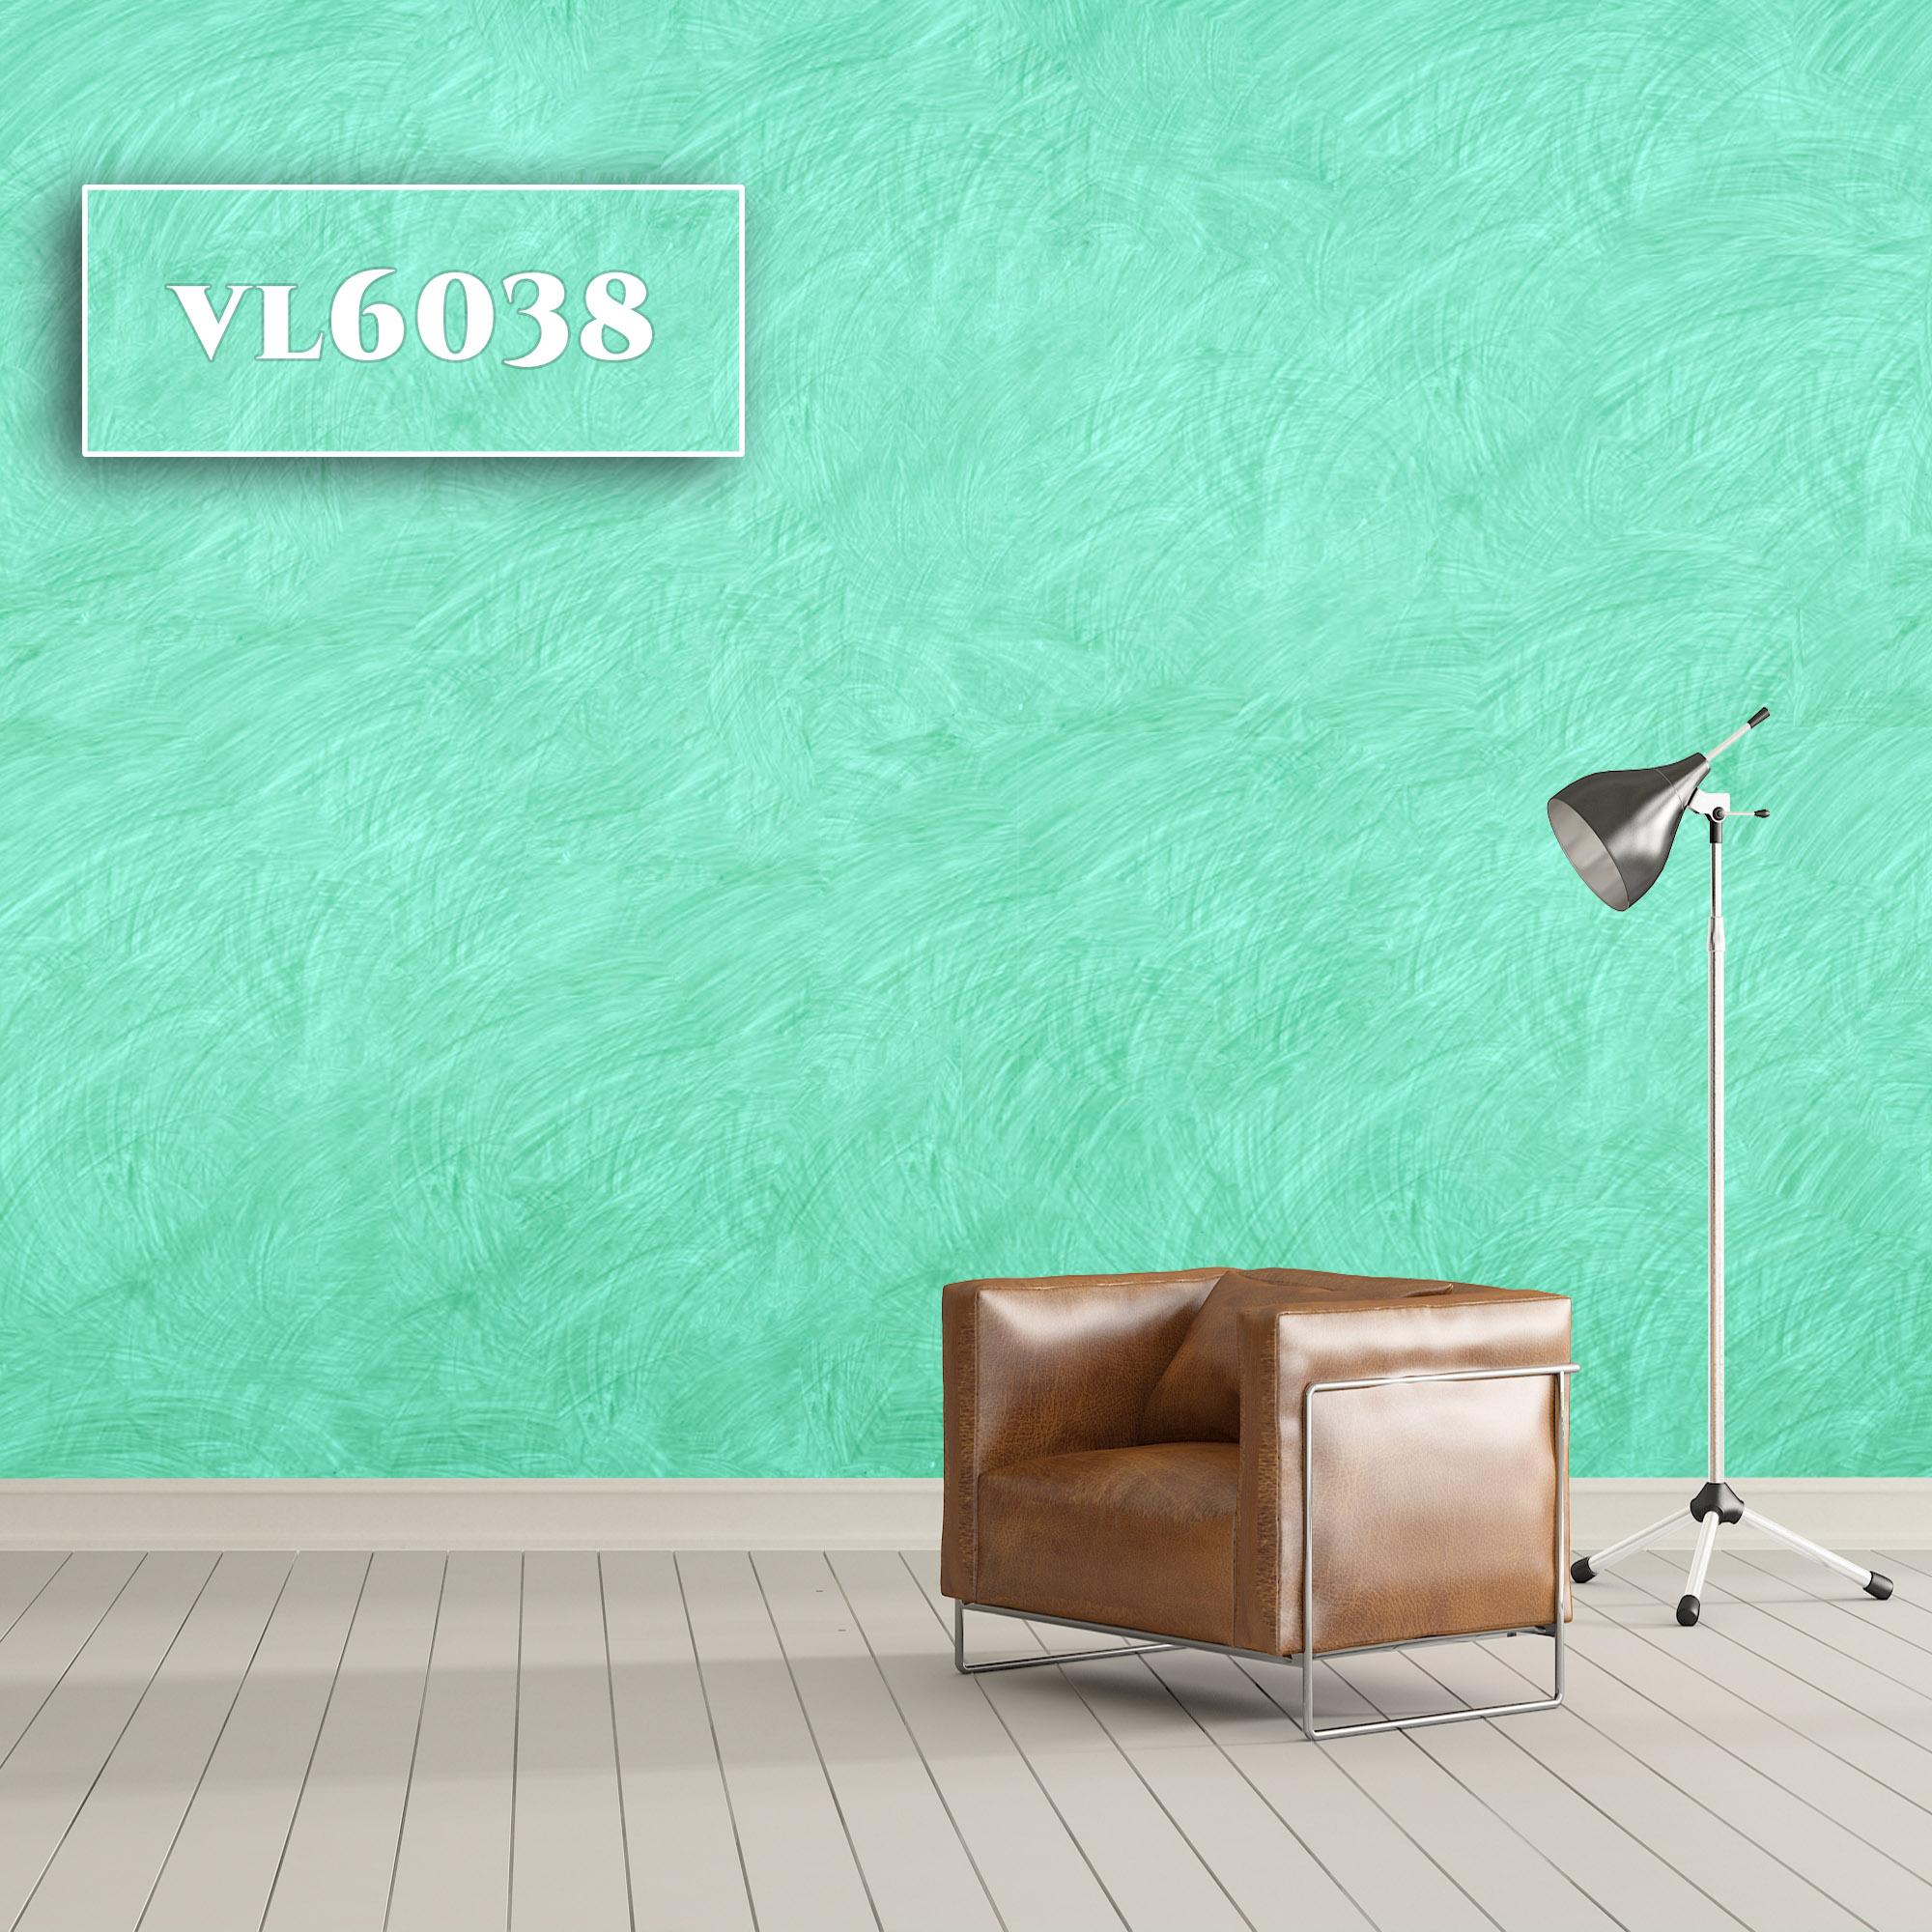 VL6038